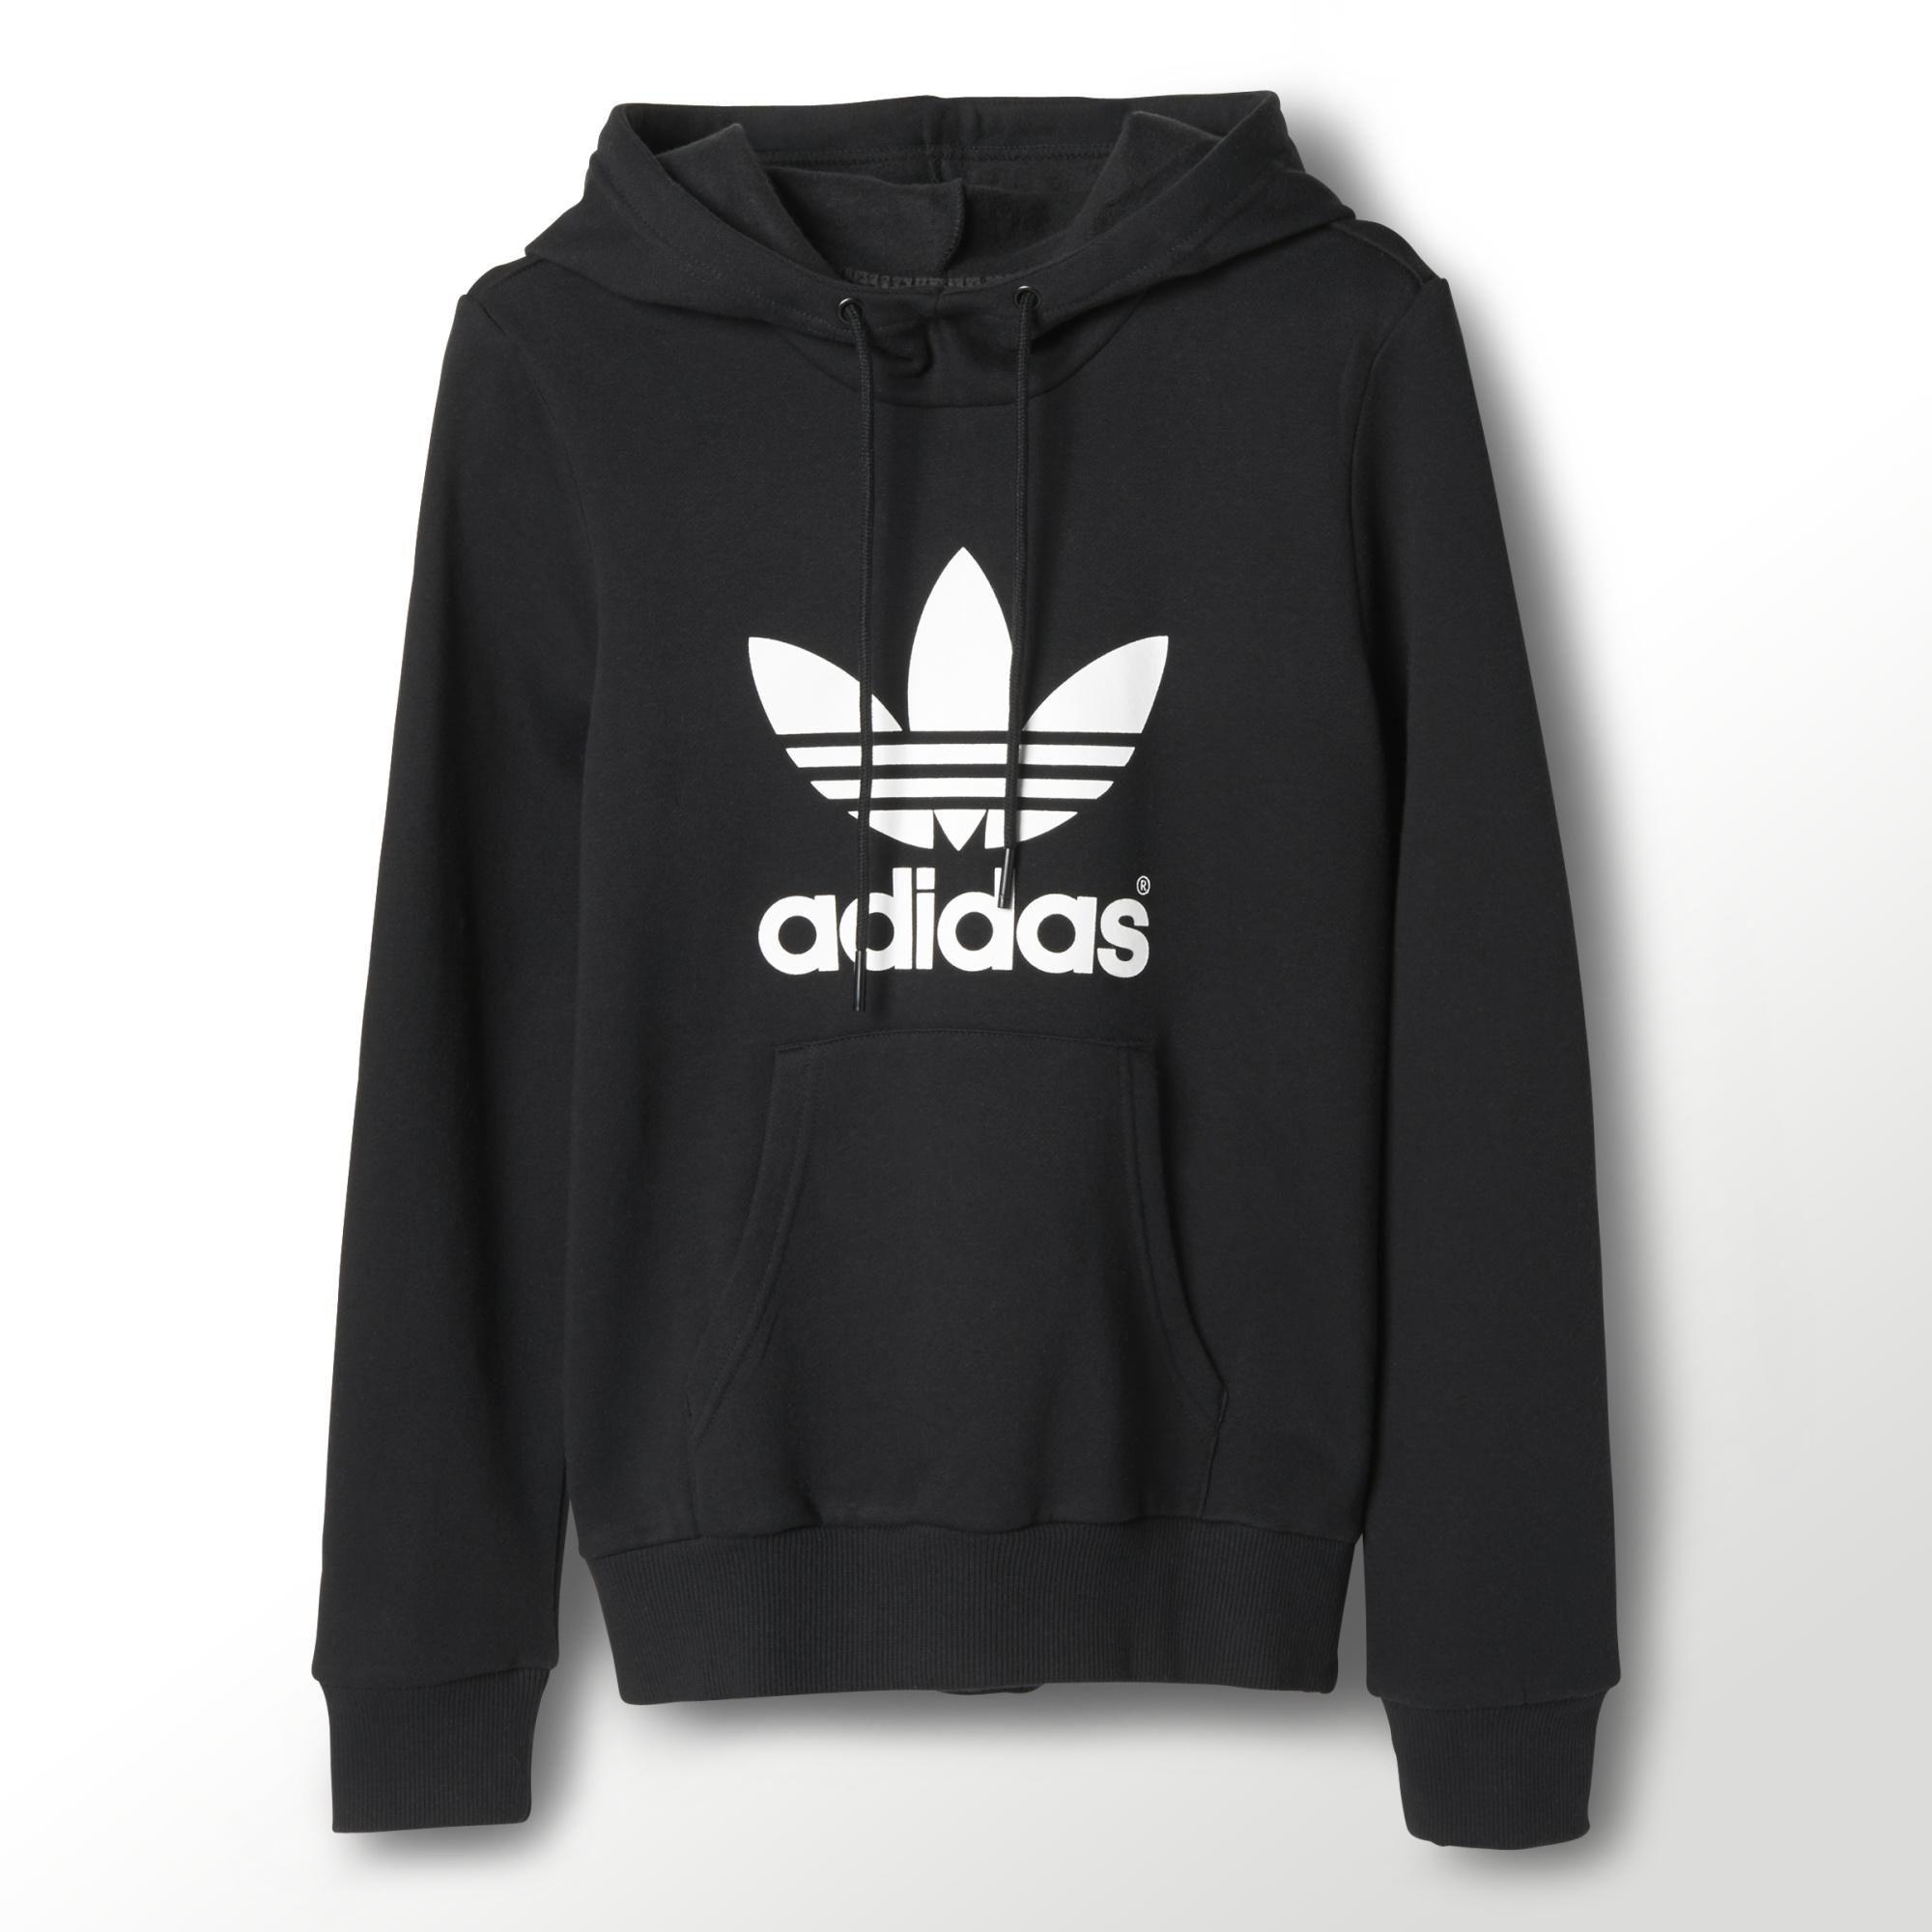 Adidas Trefoil Logo Hoodie Adidas Uk Adidas Pullover Sweatshirts Addidas Shirts [ 2000 x 2000 Pixel ]